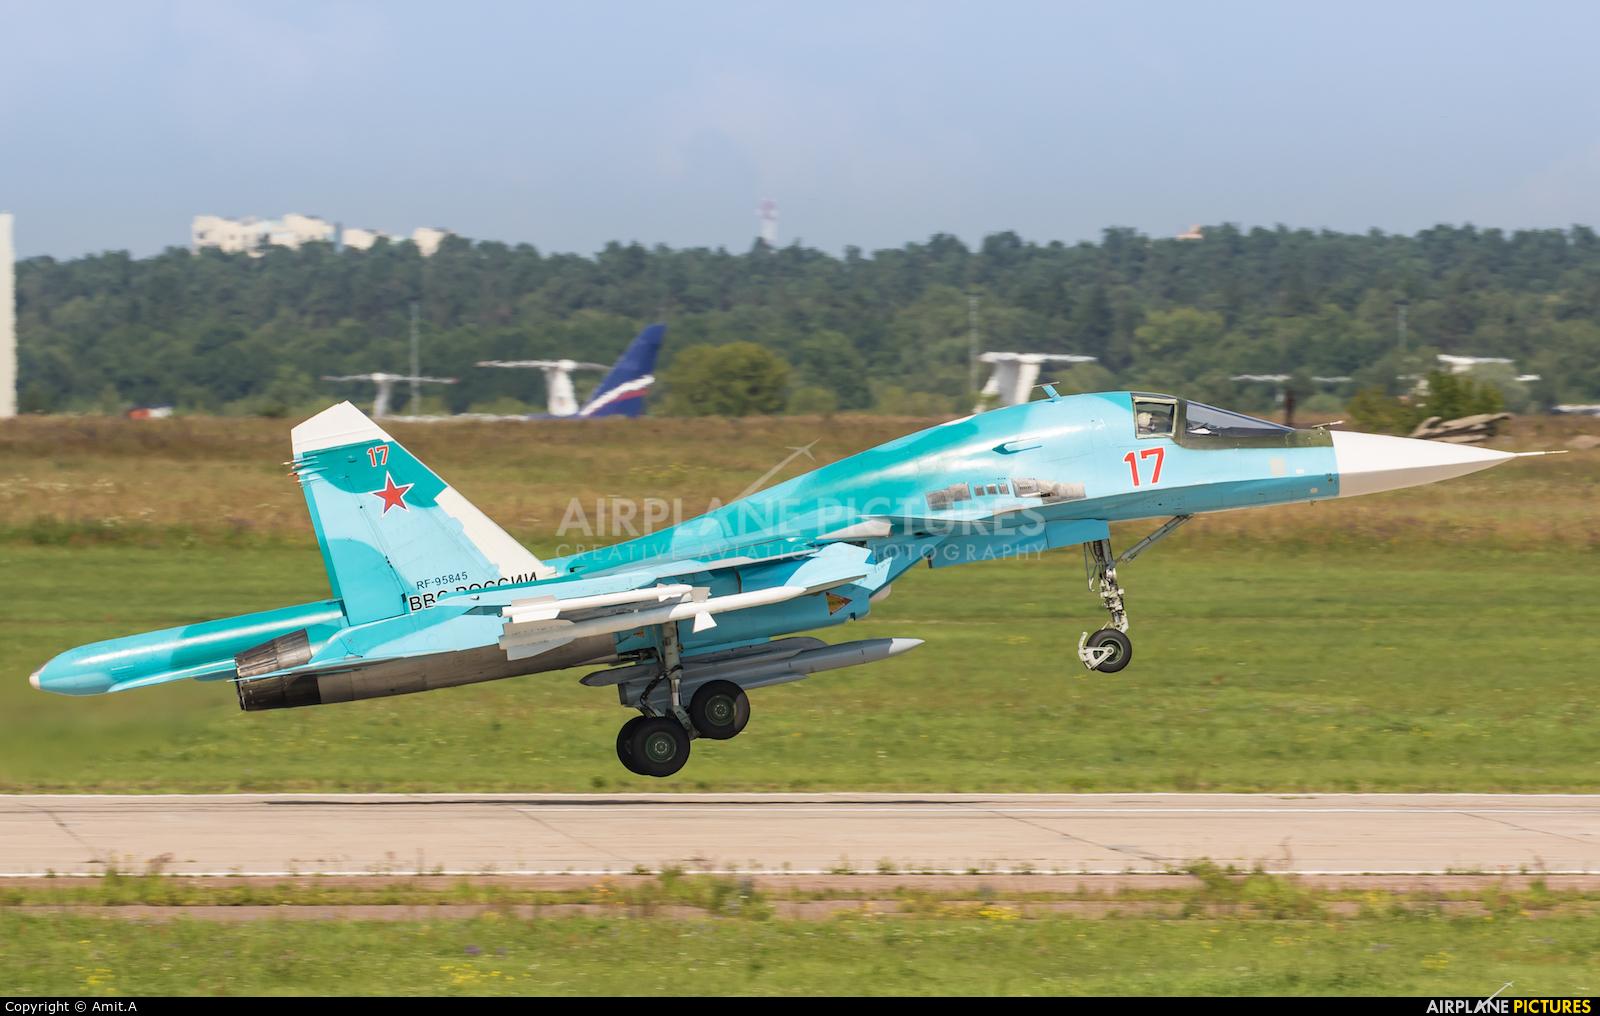 Russia - Air Force 17 aircraft at Ramenskoye - Zhukovsky